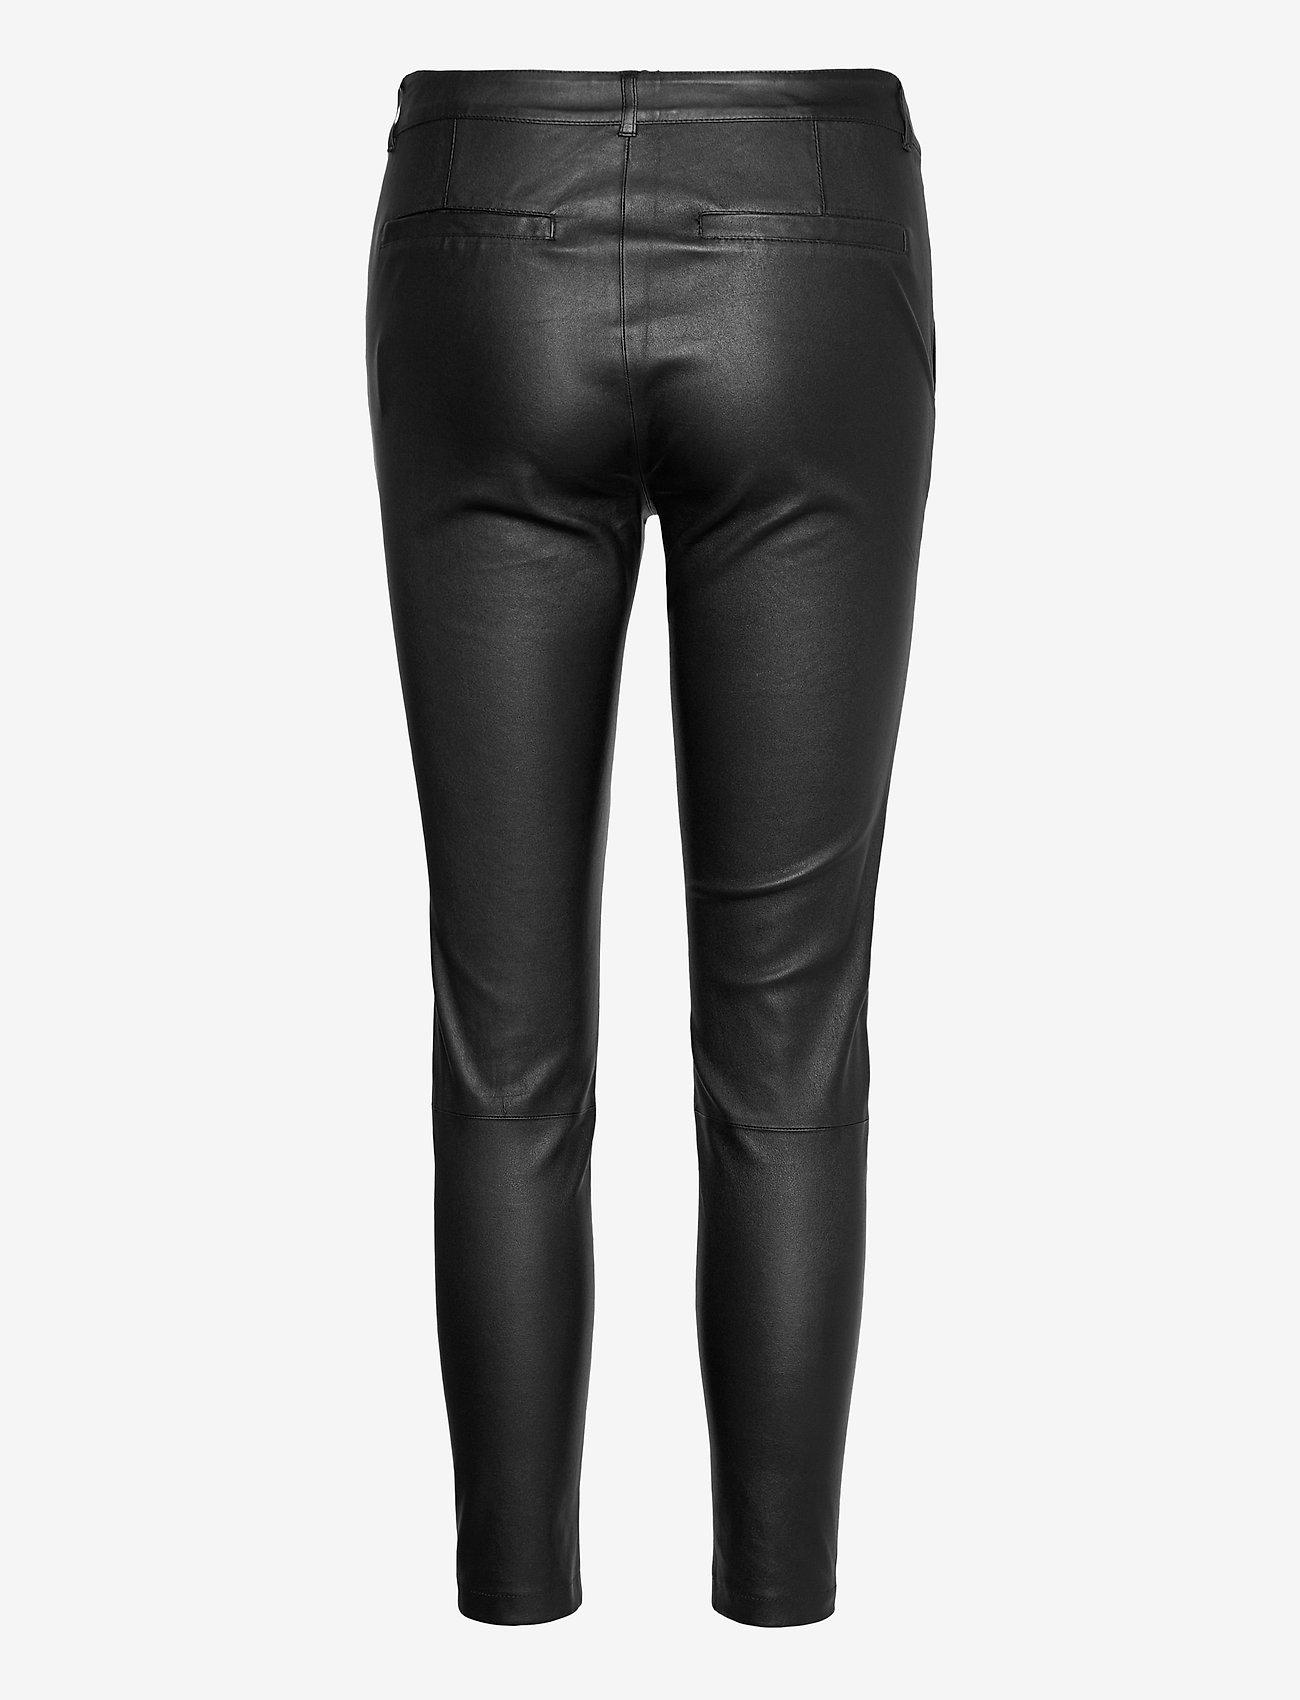 DEPECHE - Stretch pant 7/8 length - læderbukser - black - 1